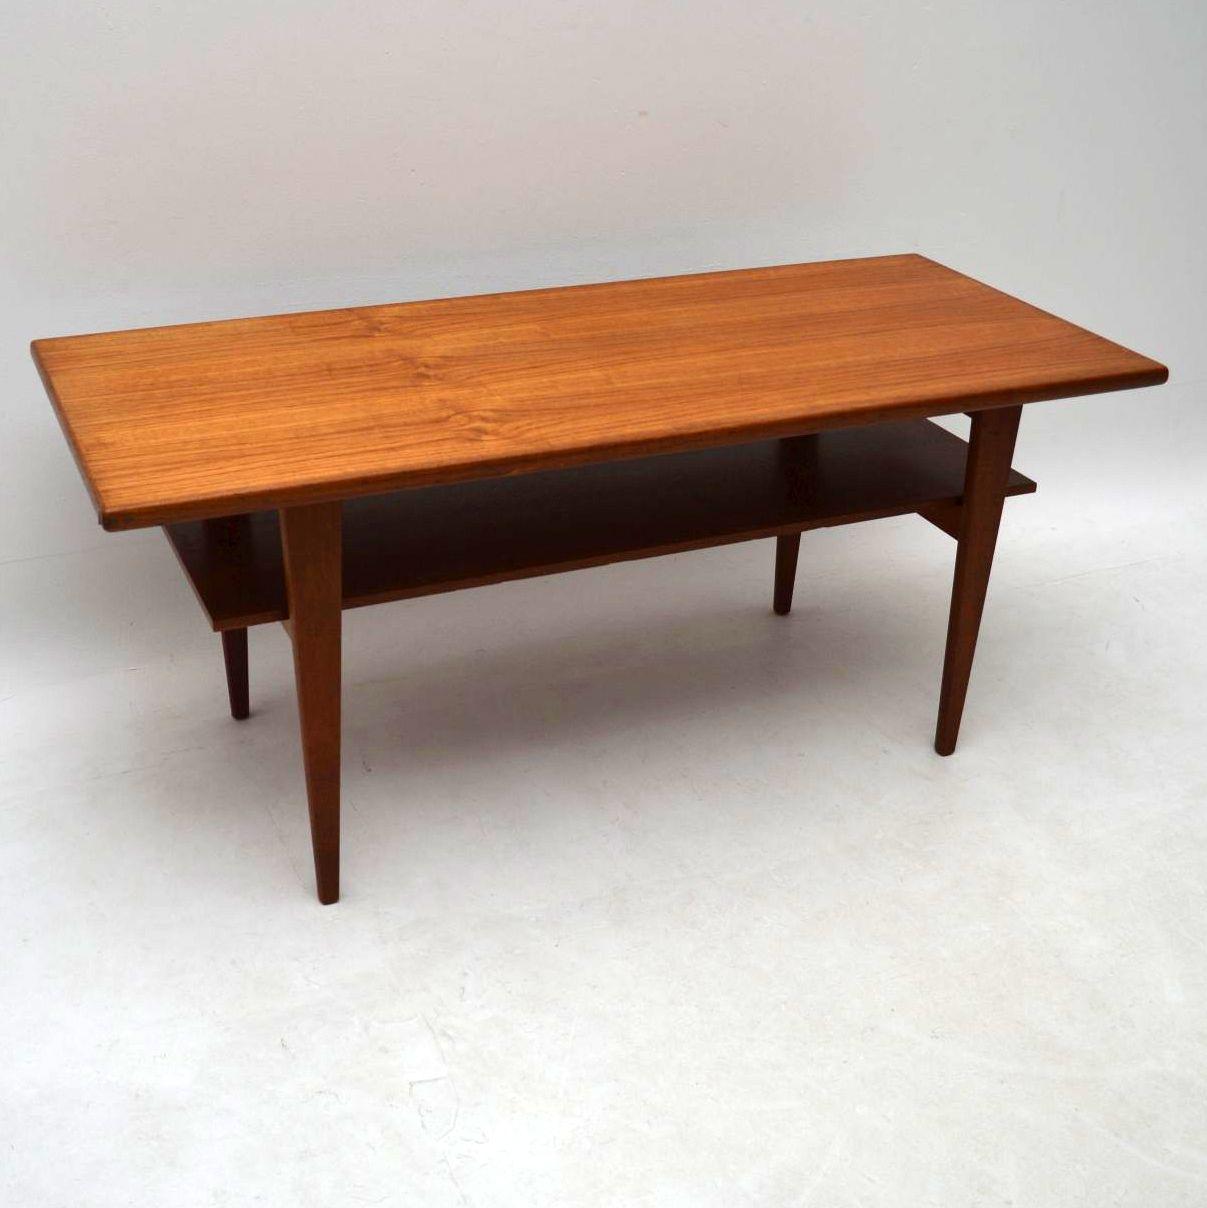 1960's Danish Teak Coffee Table